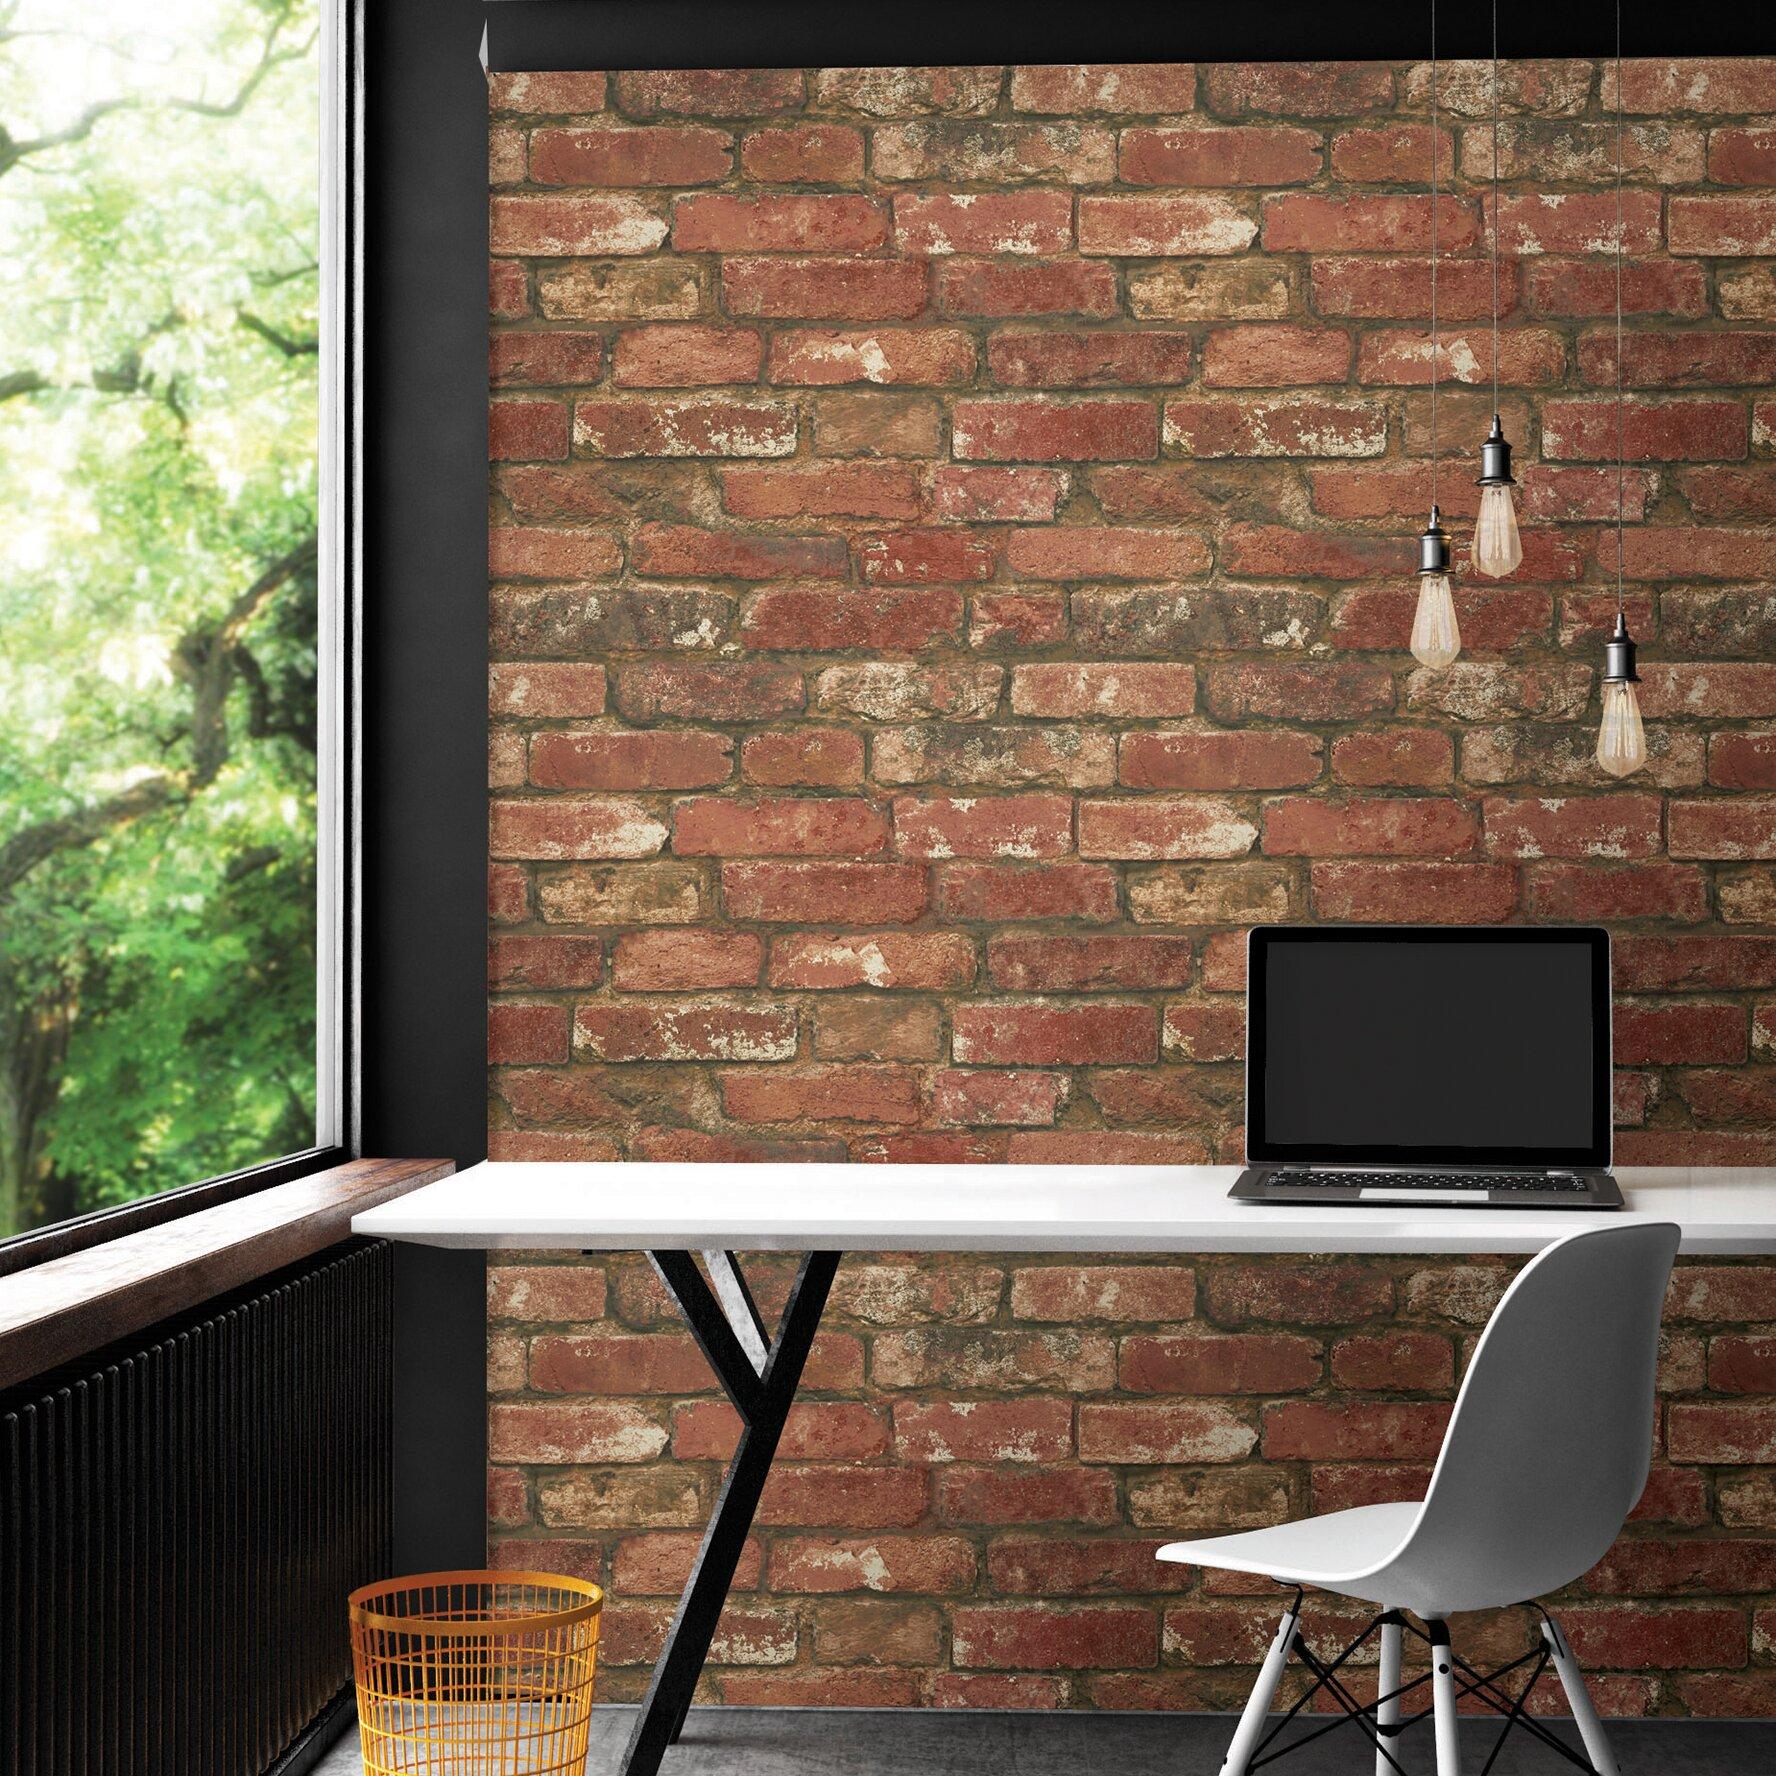 "WallPops! NuWallpaper Peel and Stick 18' x 20.5"" Brick ..."